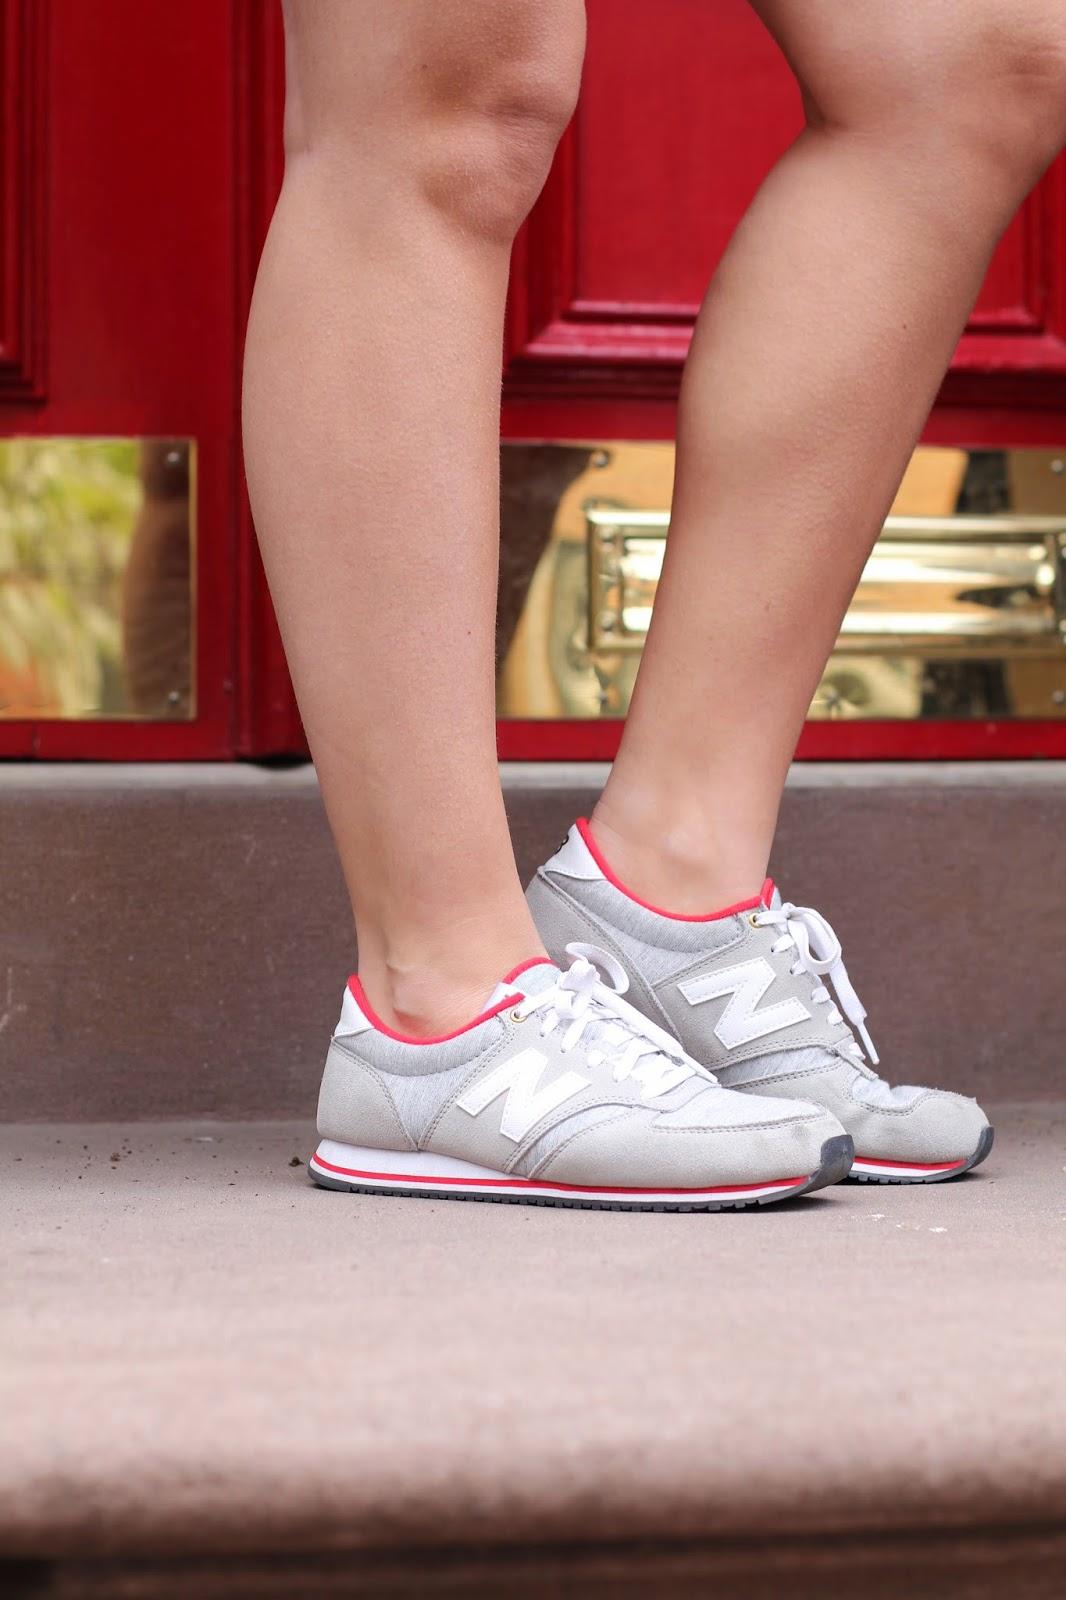 new balance sneakers fashion blog, fashion blogger sneaker style